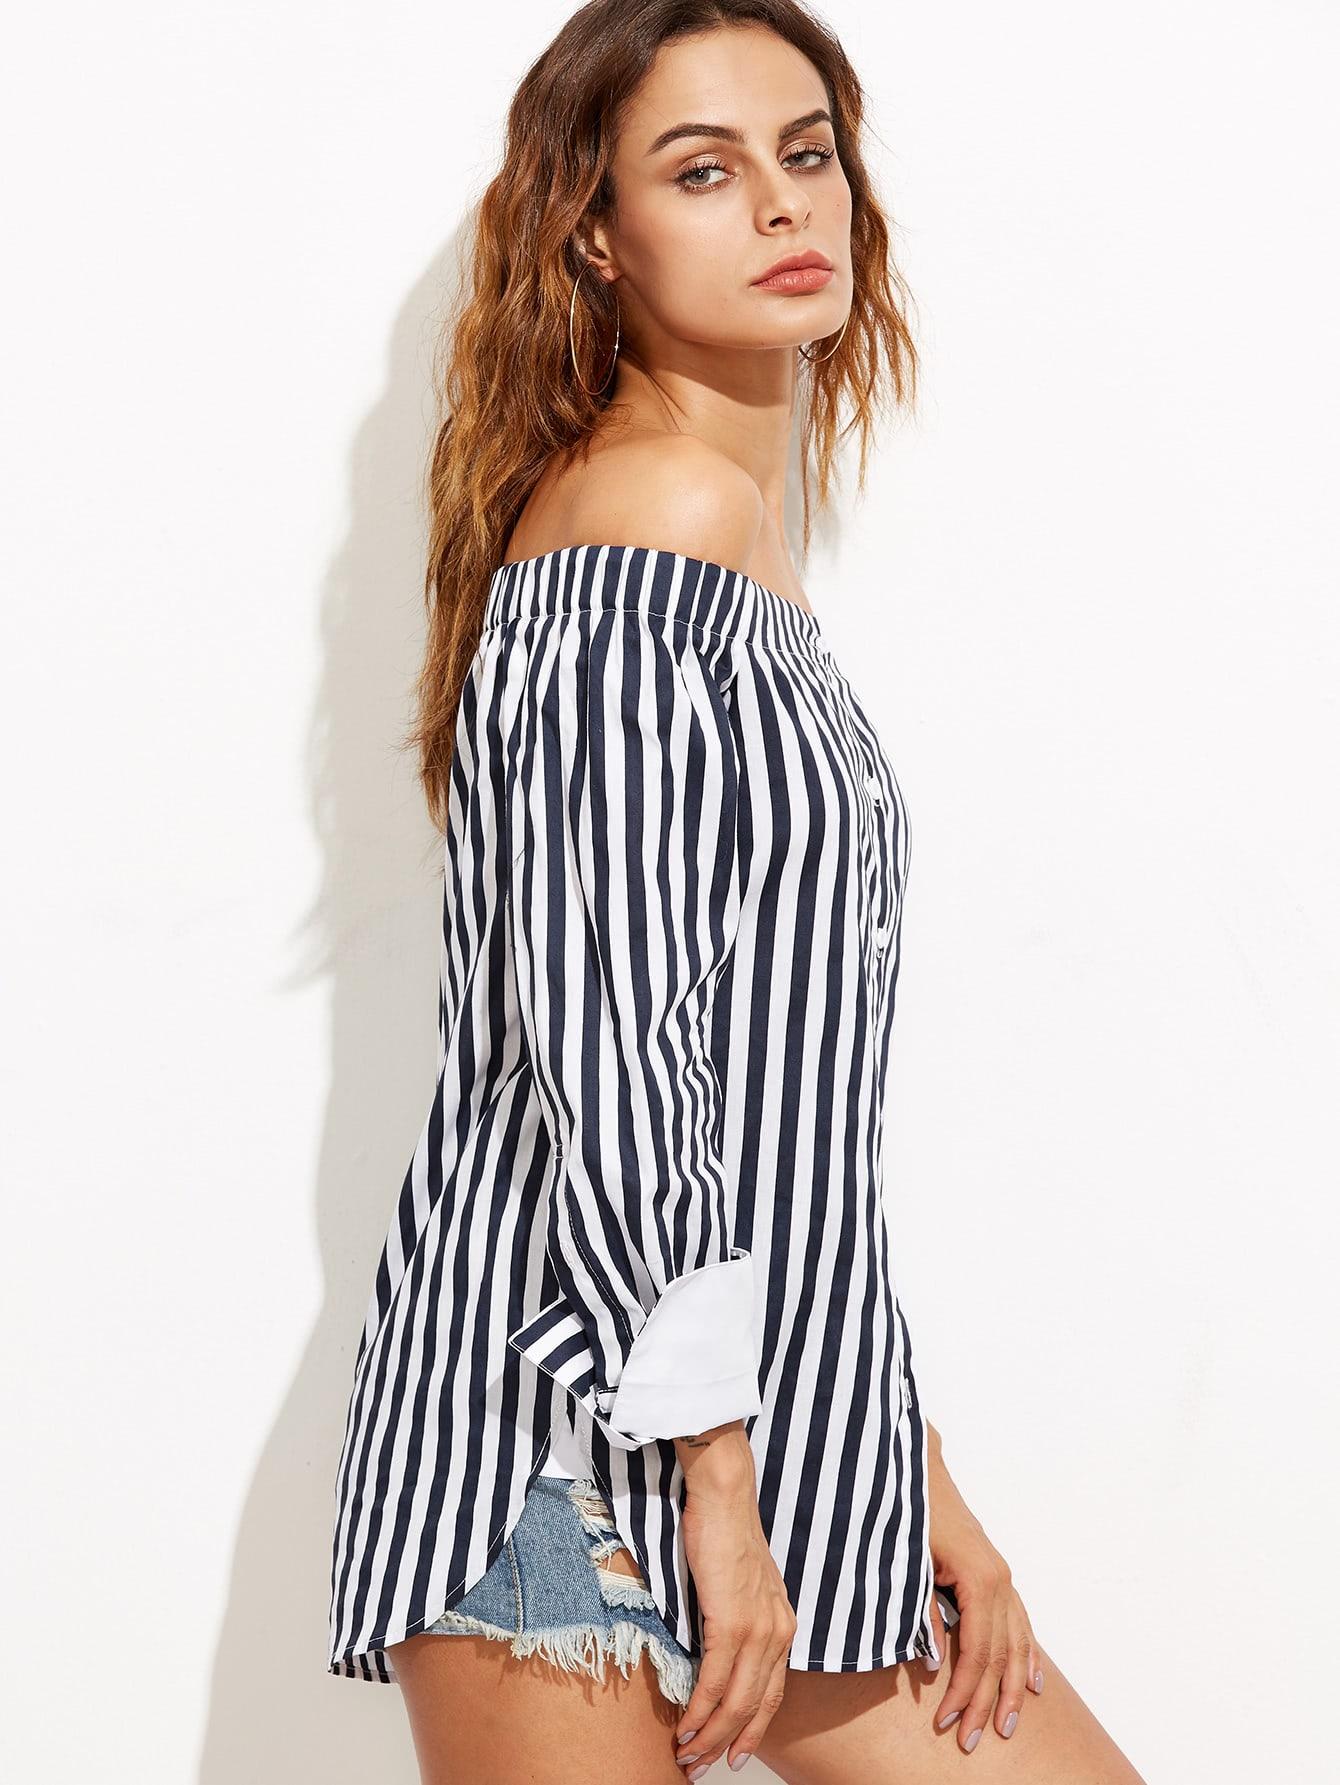 blouse160920701_2